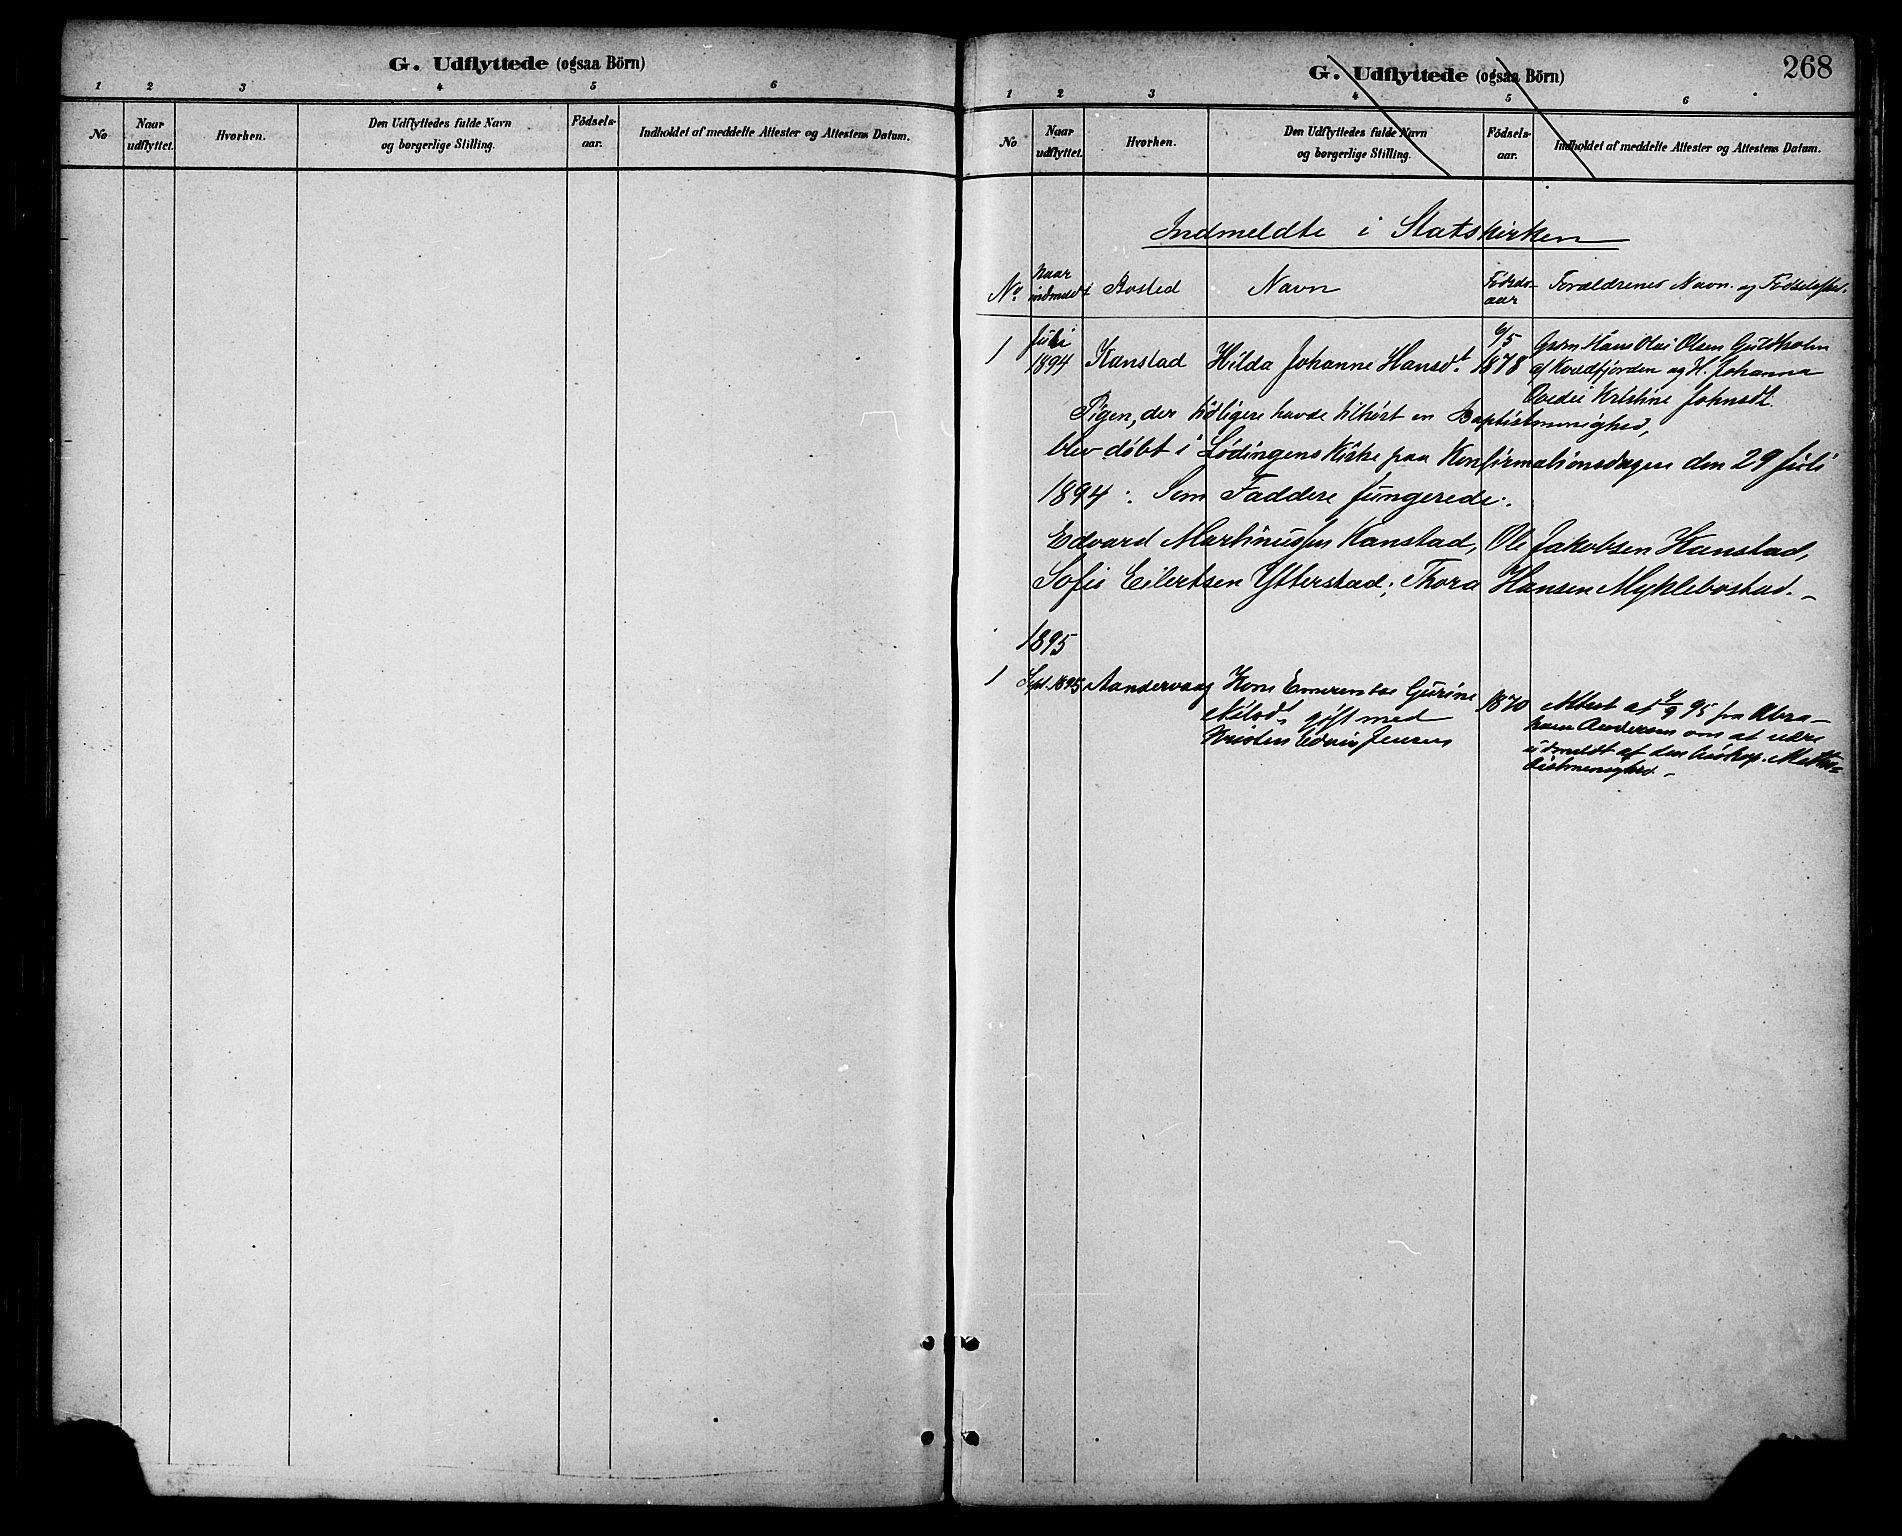 SAT, Ministerialprotokoller, klokkerbøker og fødselsregistre - Nordland, 872/L1035: Ministerialbok nr. 872A10, 1884-1896, s. 268